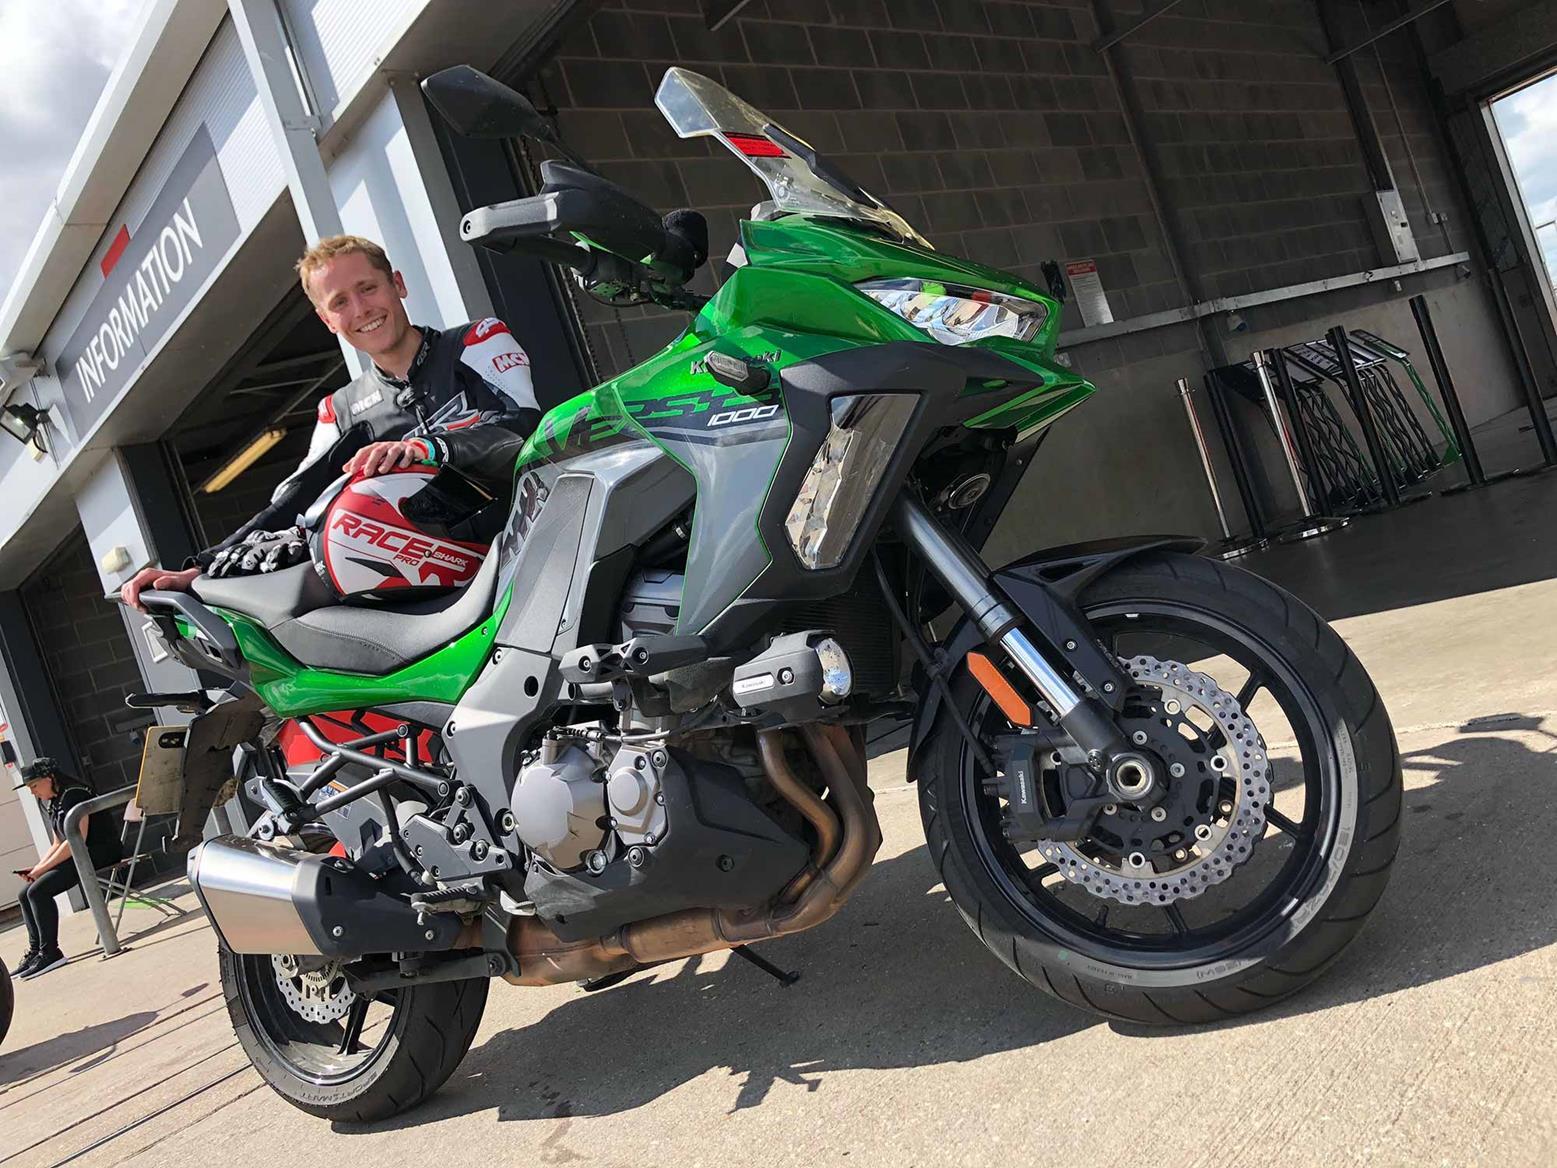 Dan with the Kawasaki Versys 1000 SE